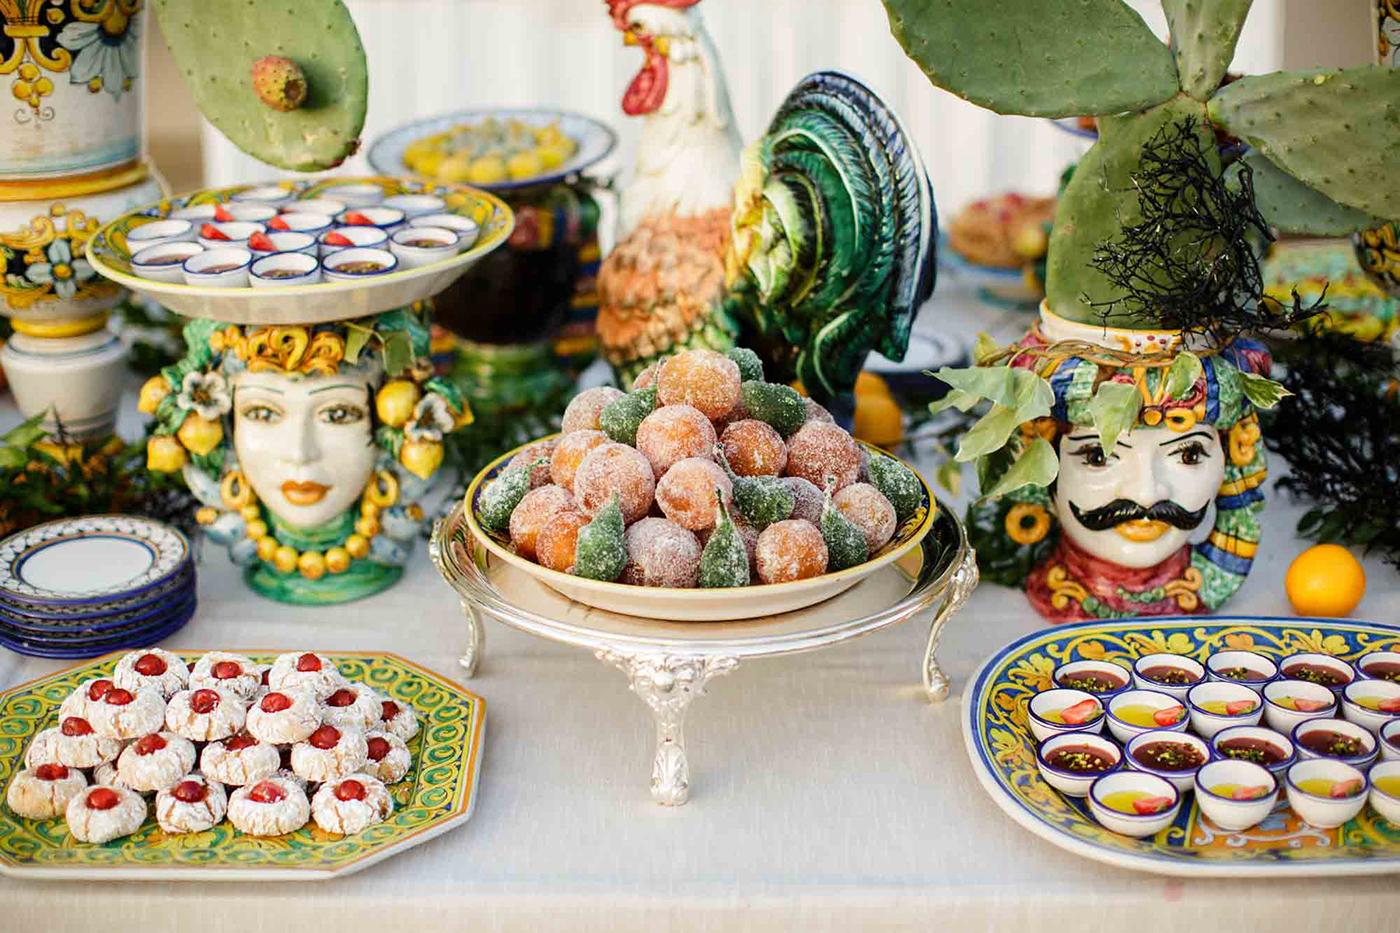 joee-wong-belmond-hotels-italy-food11